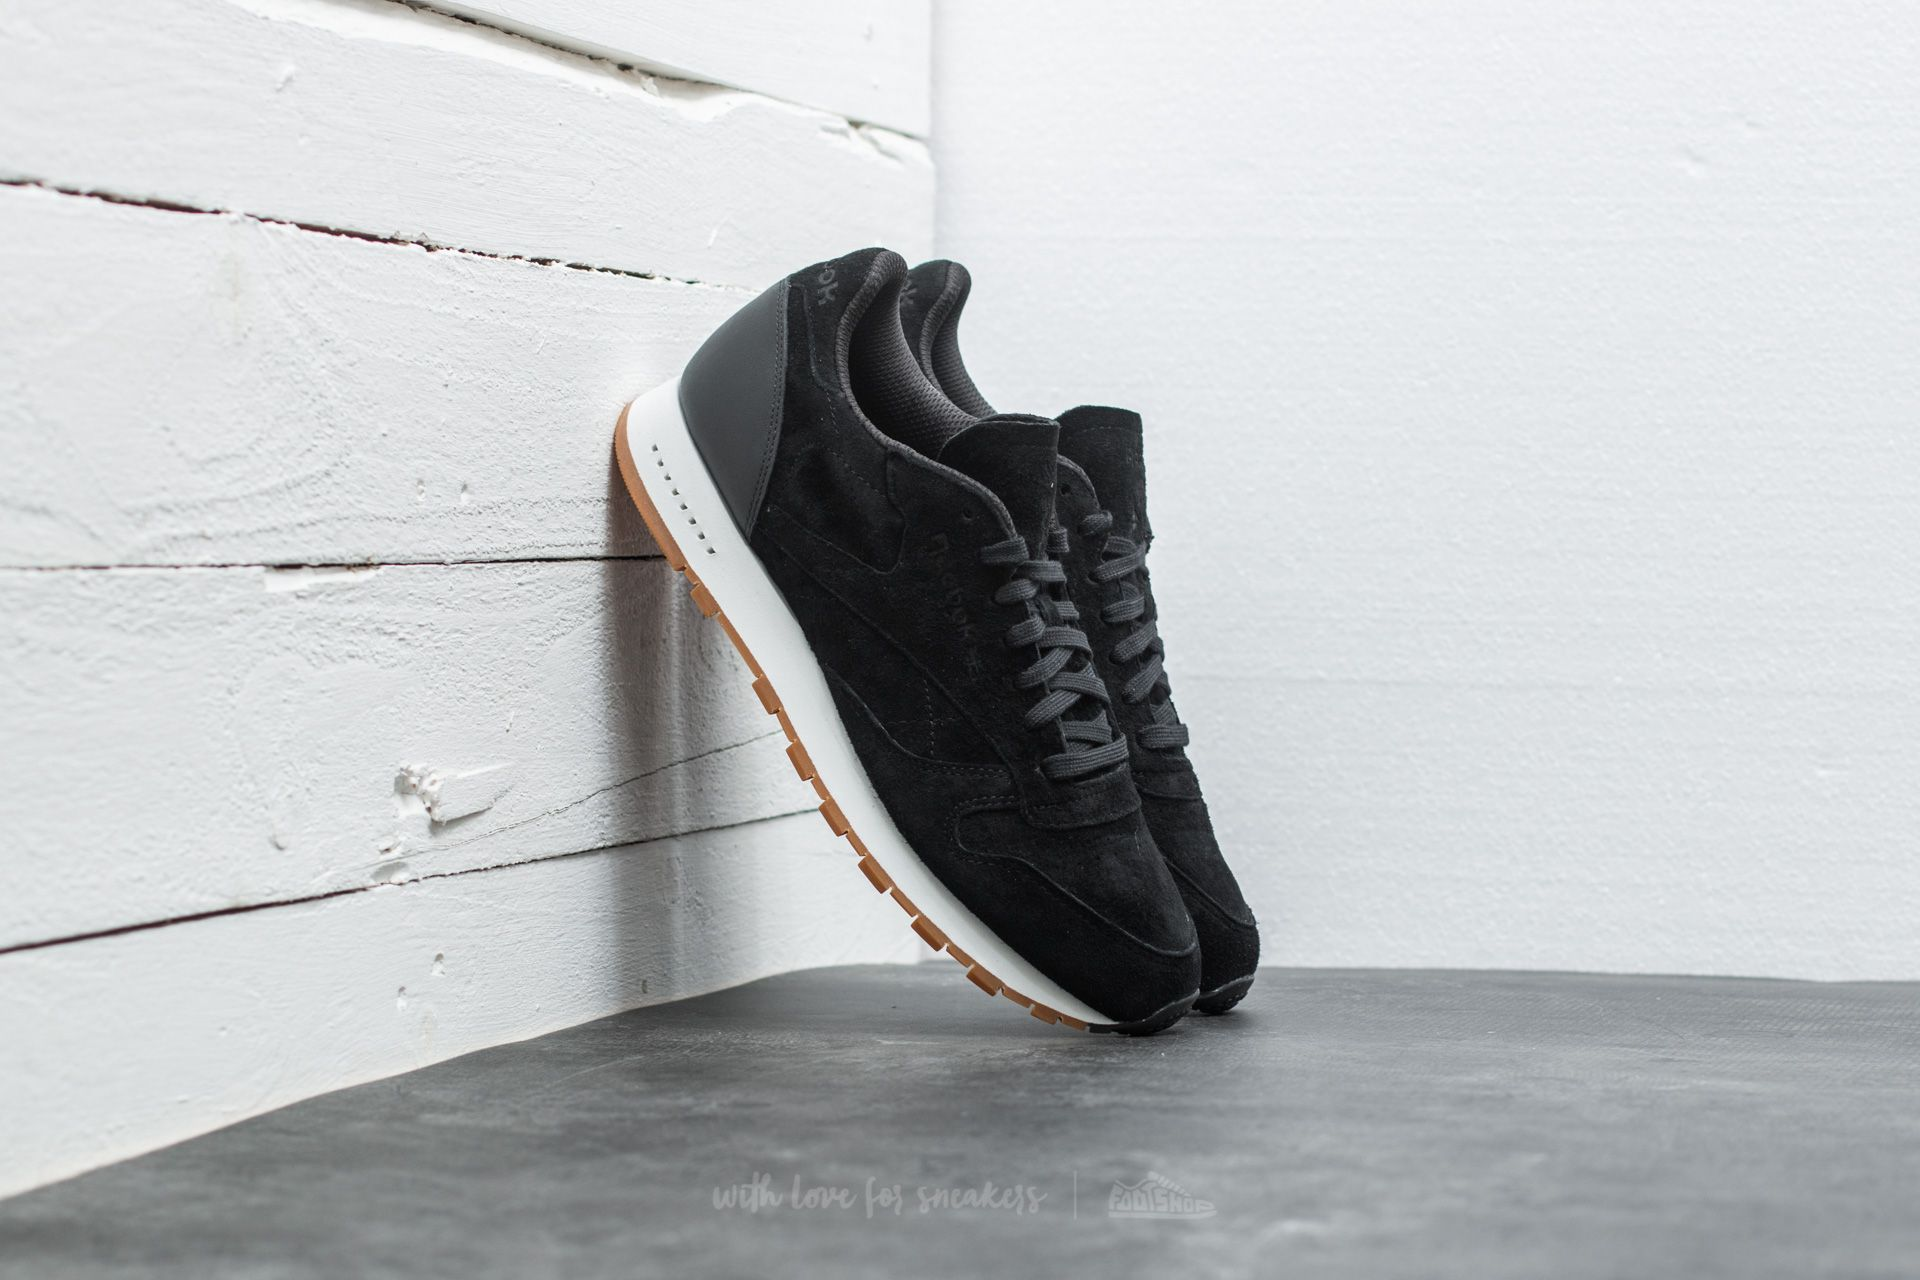 Reebok Classic Leather Seasonal Gum Black Chalk Gum | Footshop